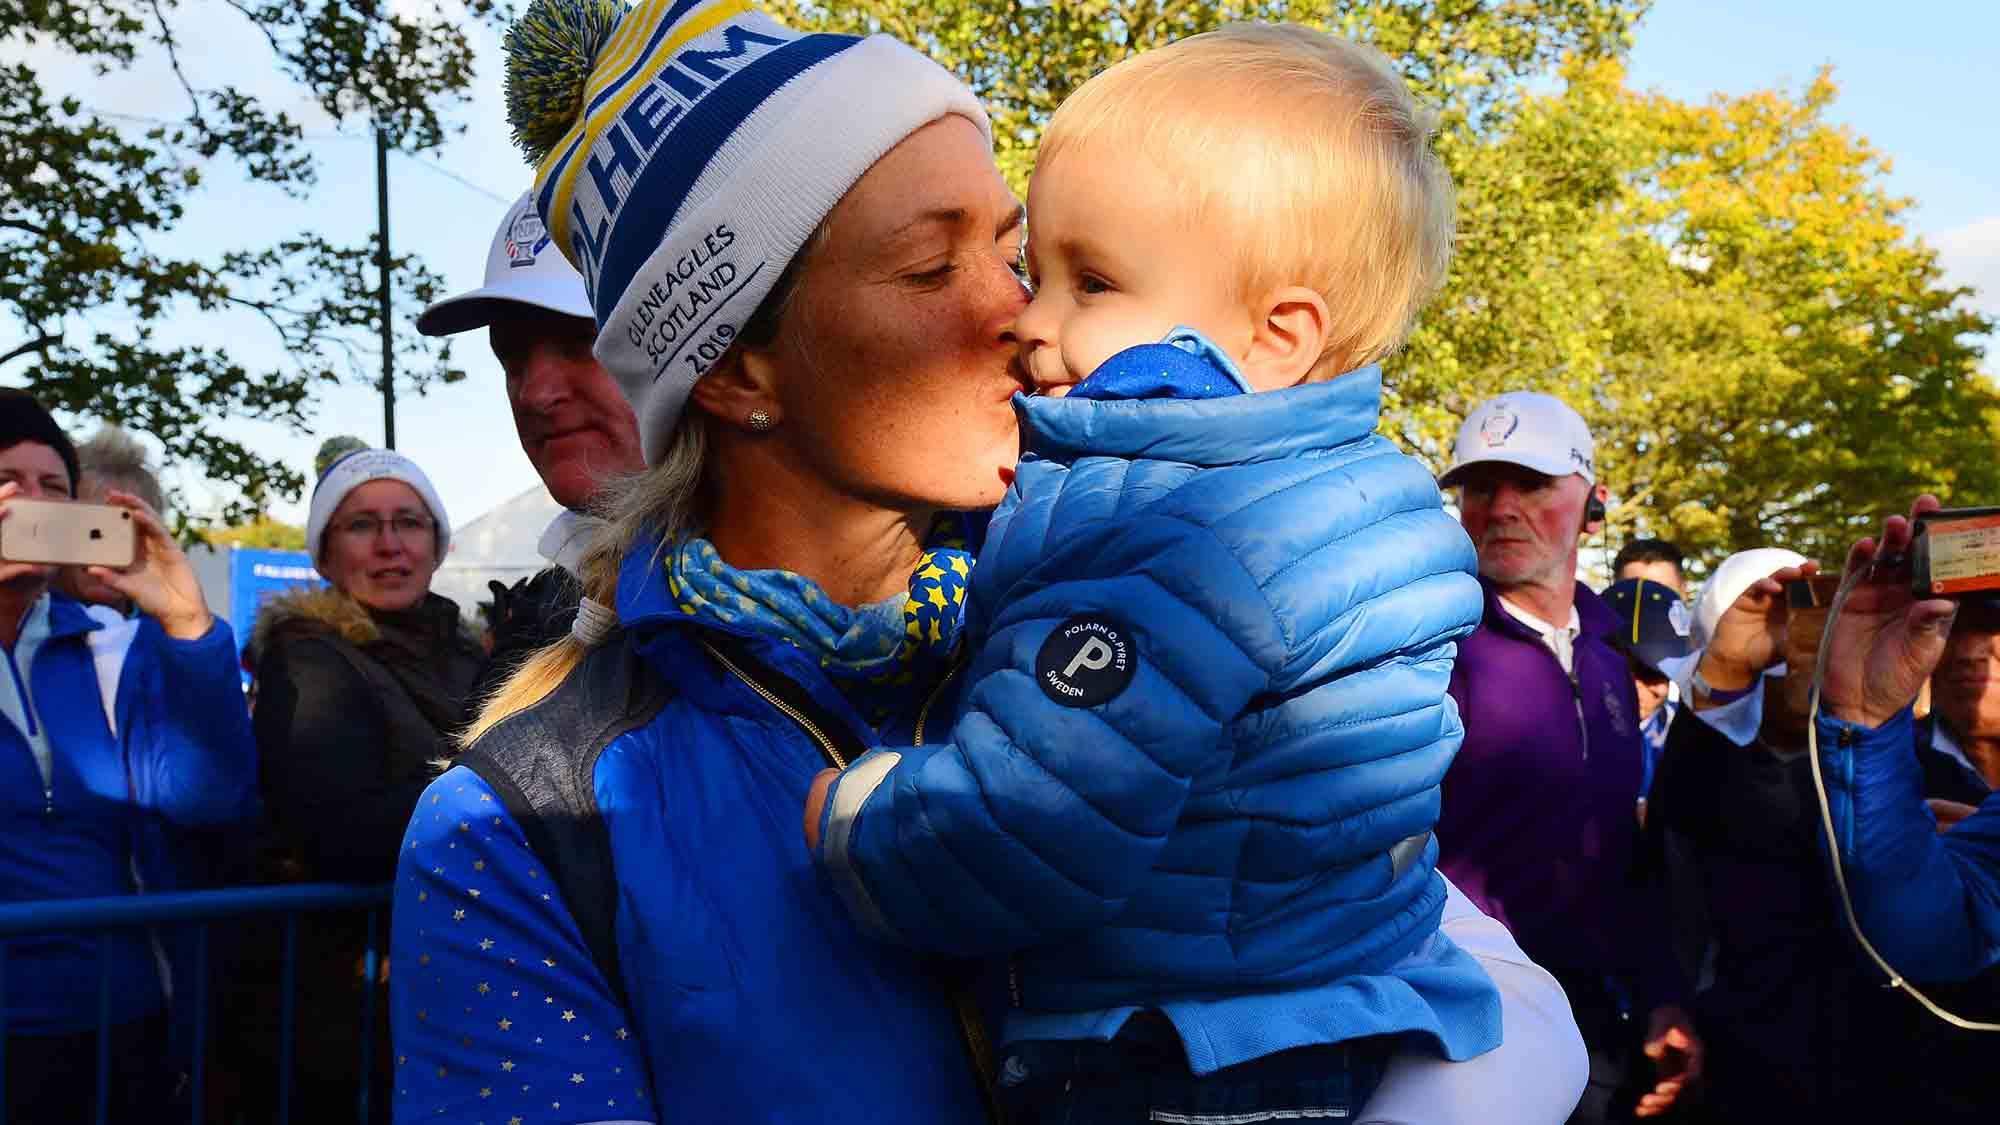 2019 Suzann Pettersen Letter To Herman Lpga Ladies Professional Golf Association